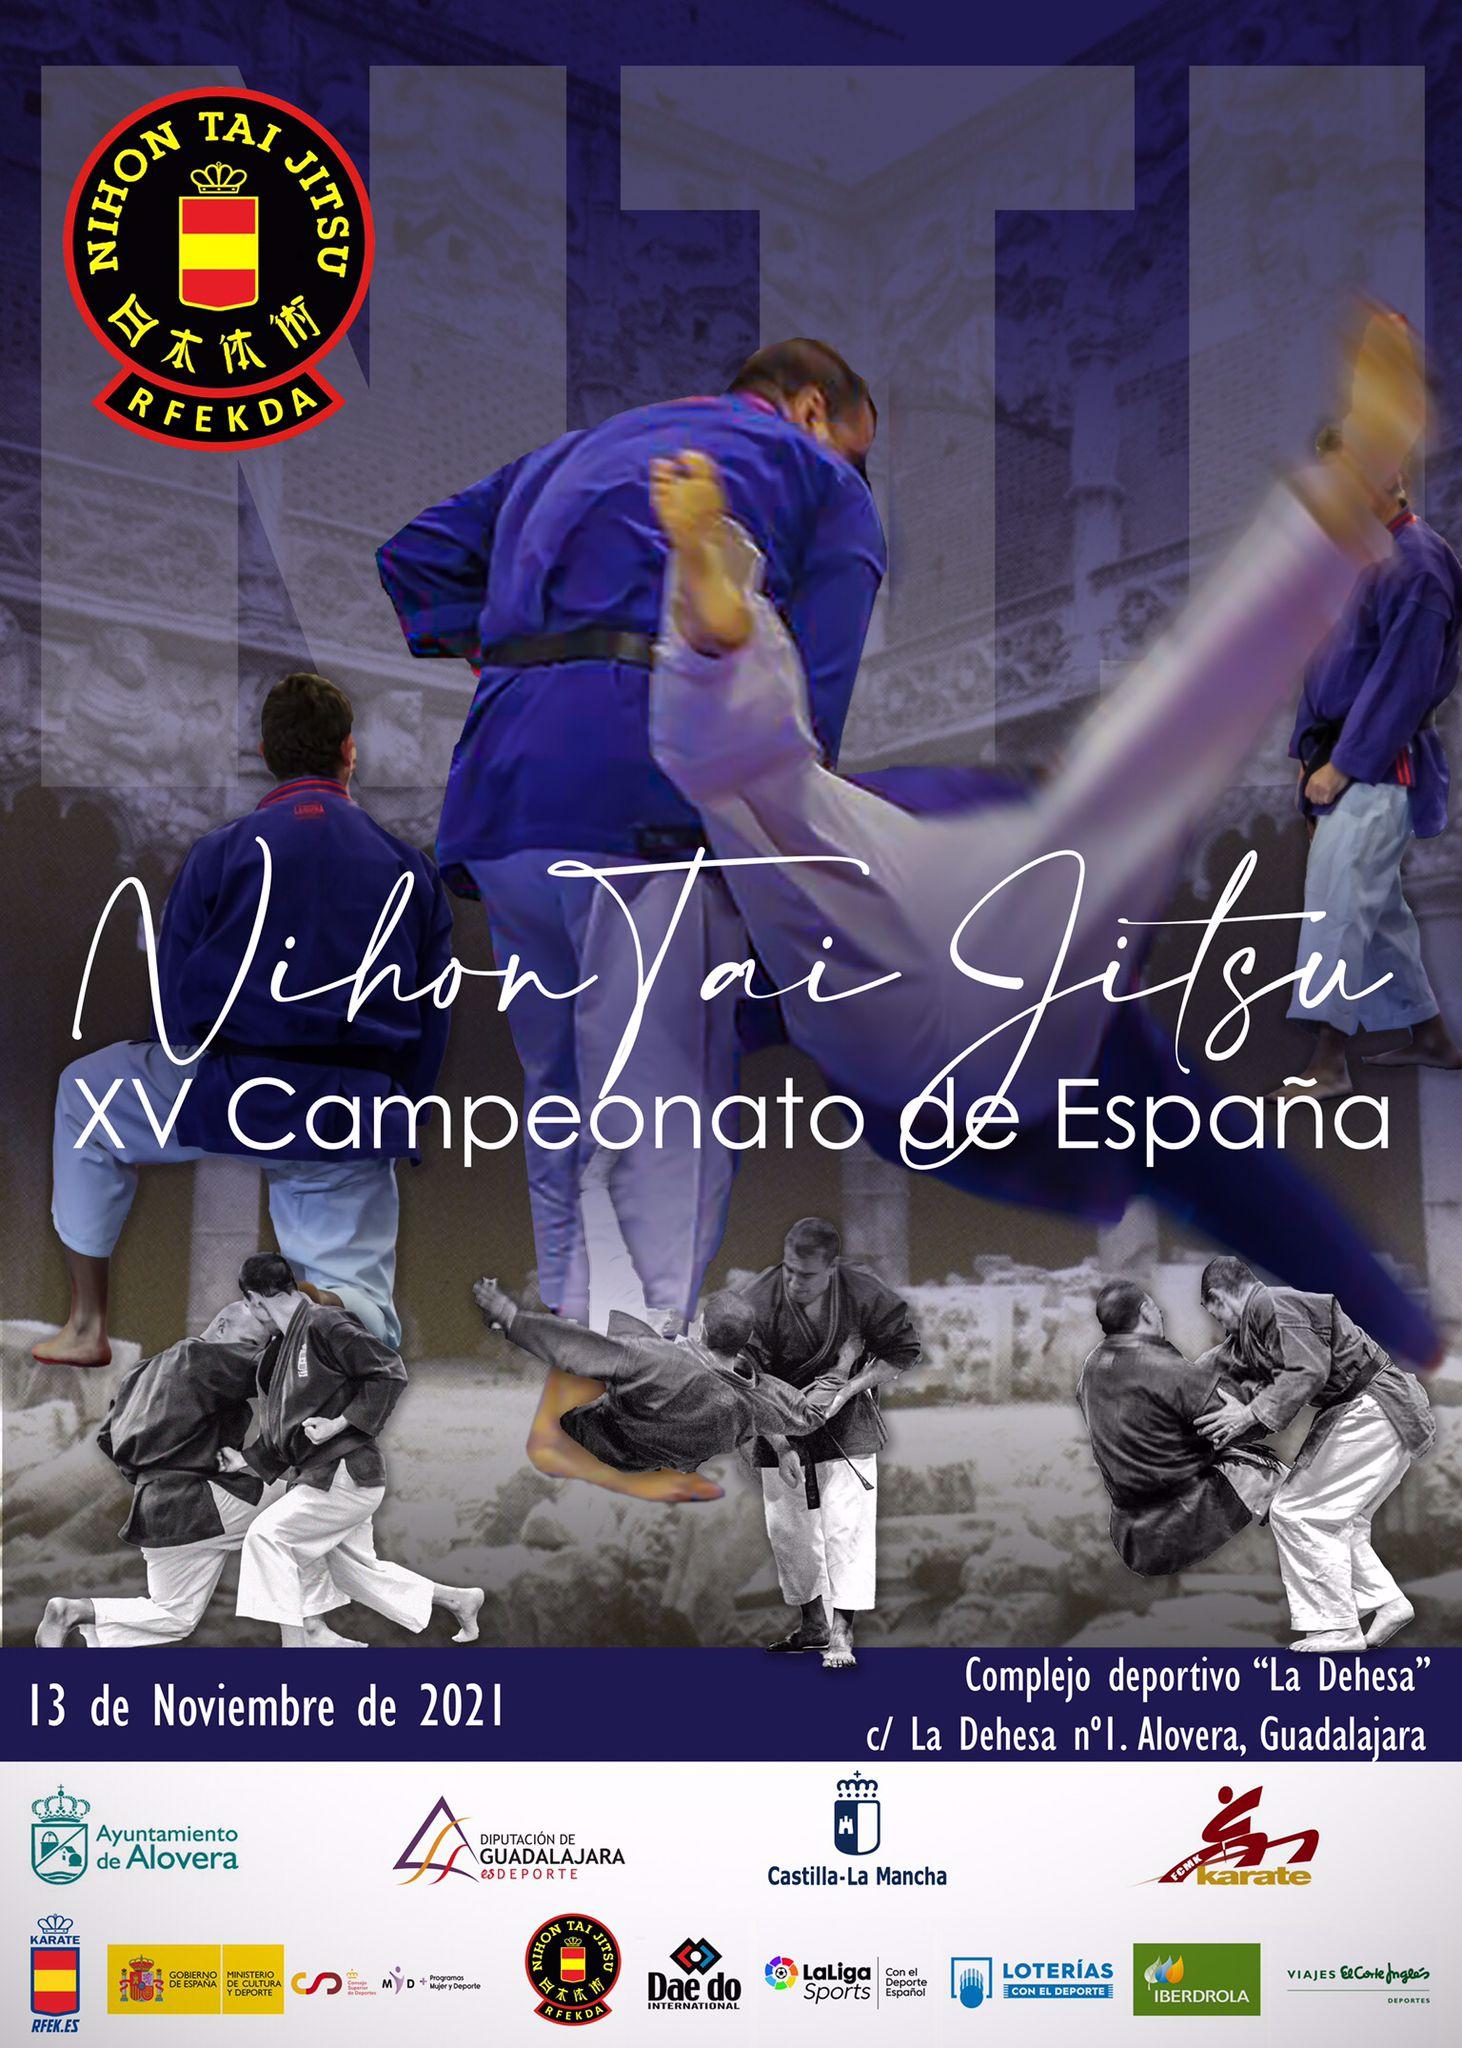 Campeonato de España 2021 Nihon-Taijitsu